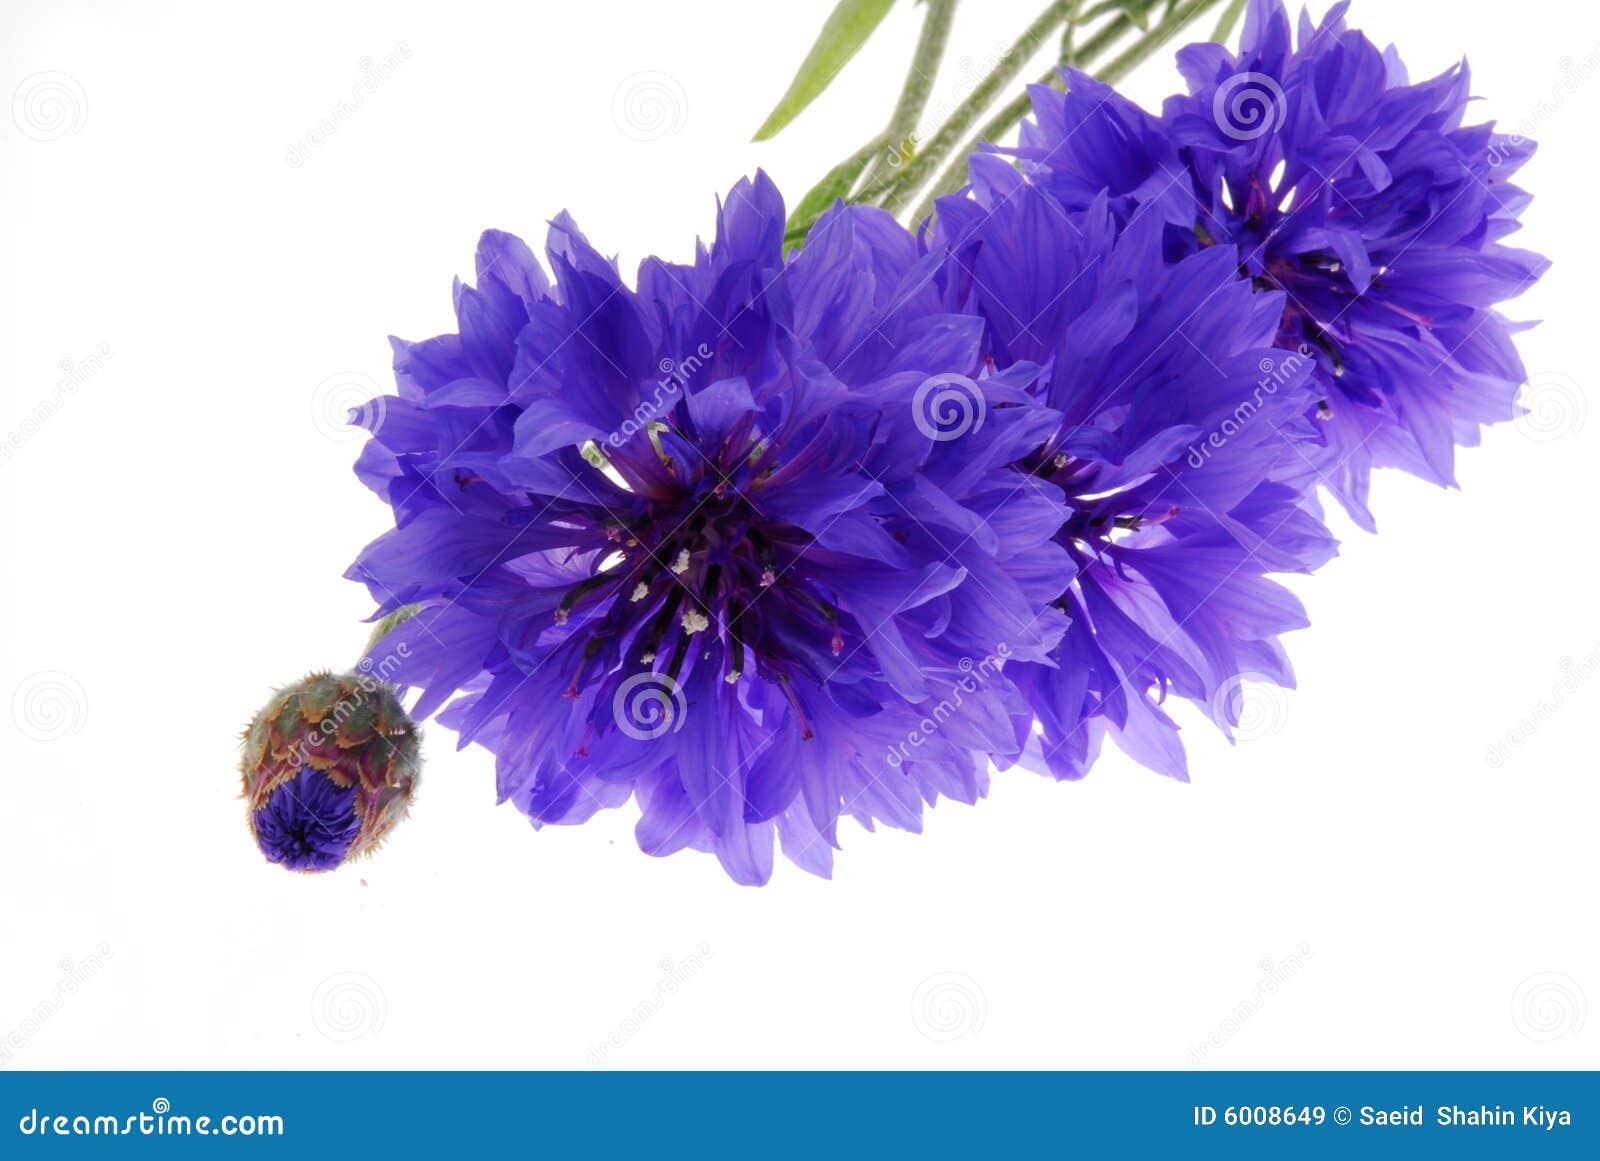 Pretty Purple Flowers White Background Pretty purple flowers on white